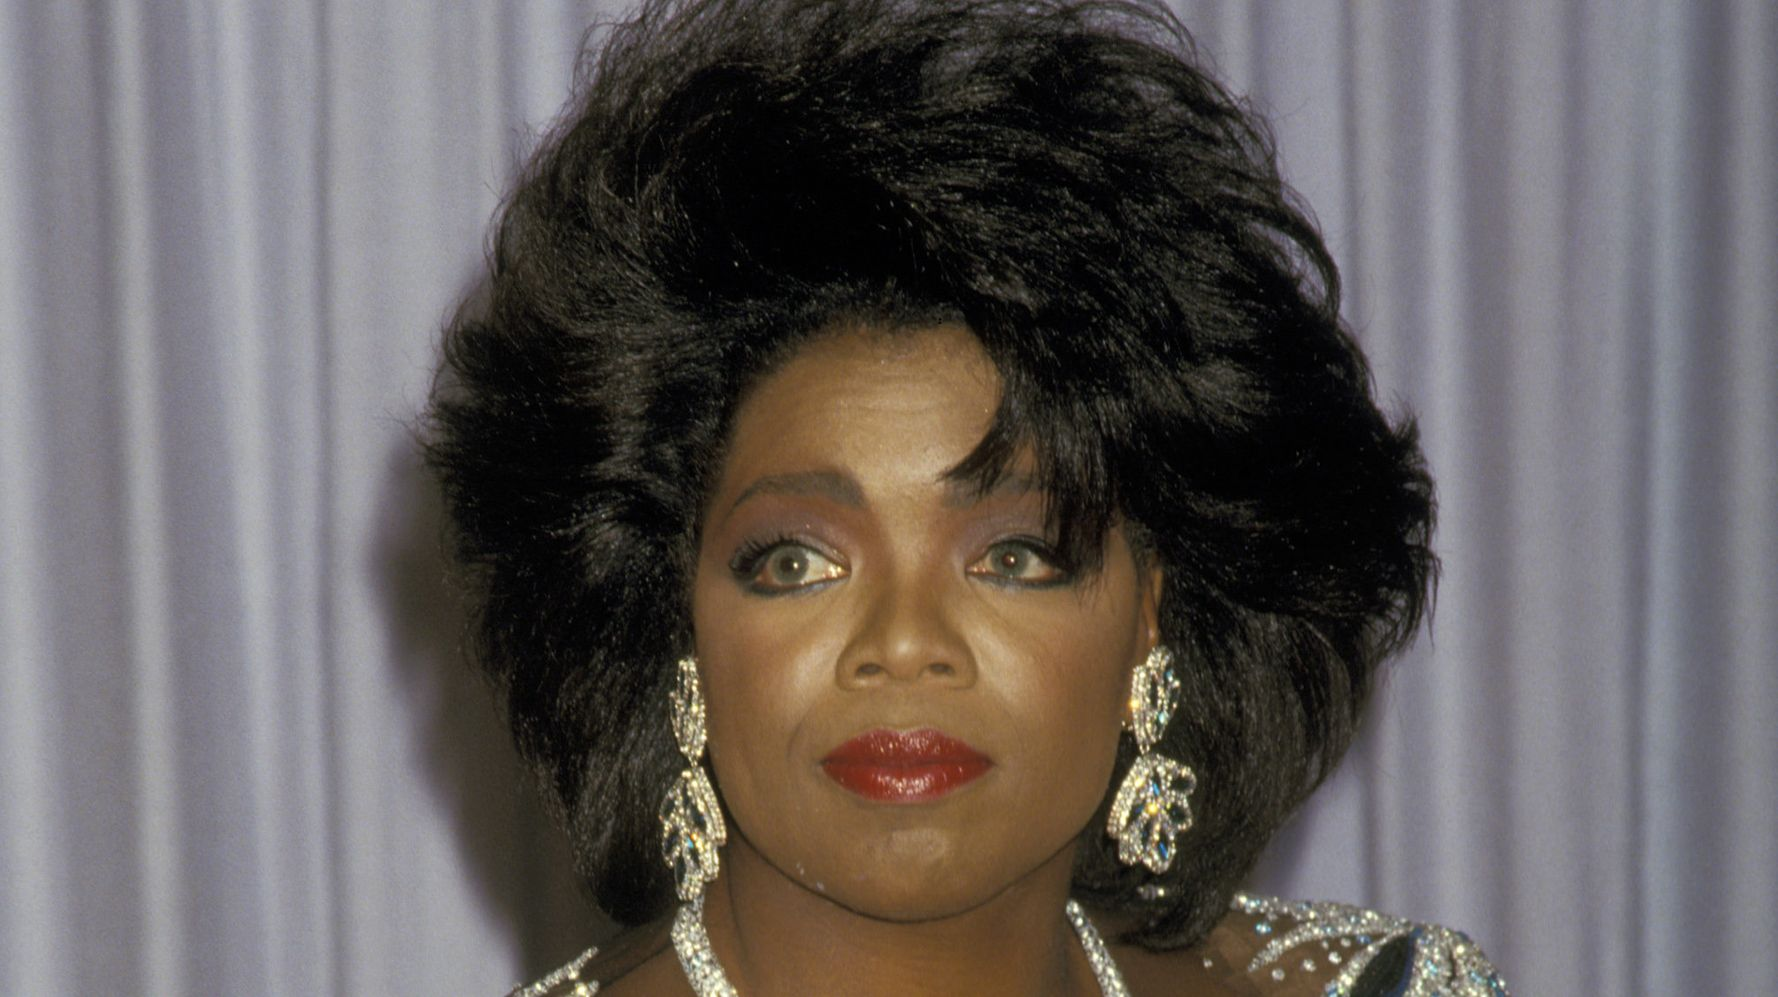 Oprah Winfrey Has Taken A Pretty Amazing Hair Journey